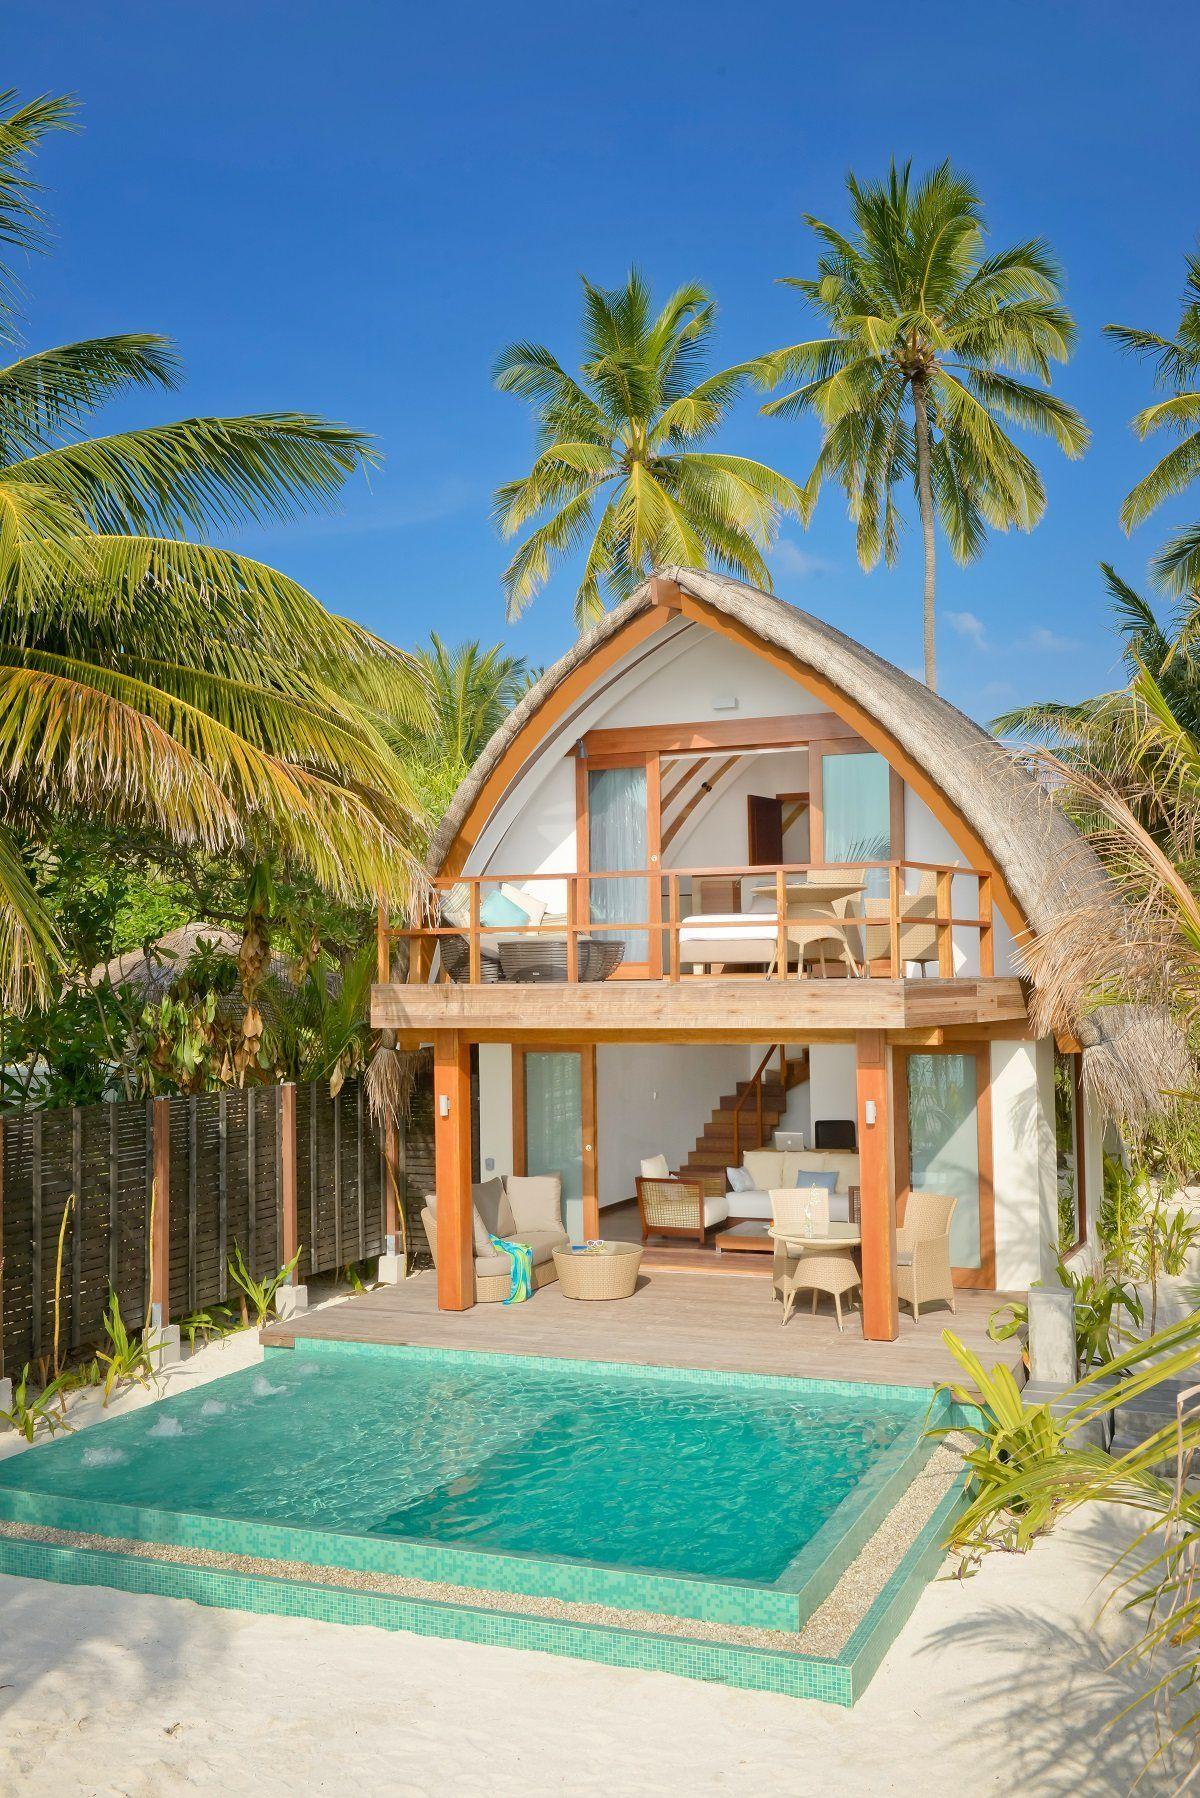 Beach House in Maldives | Hobby&decor | #hobbydecor #design #decor #arquitetura #home | Instagram.com/@hobbydecor